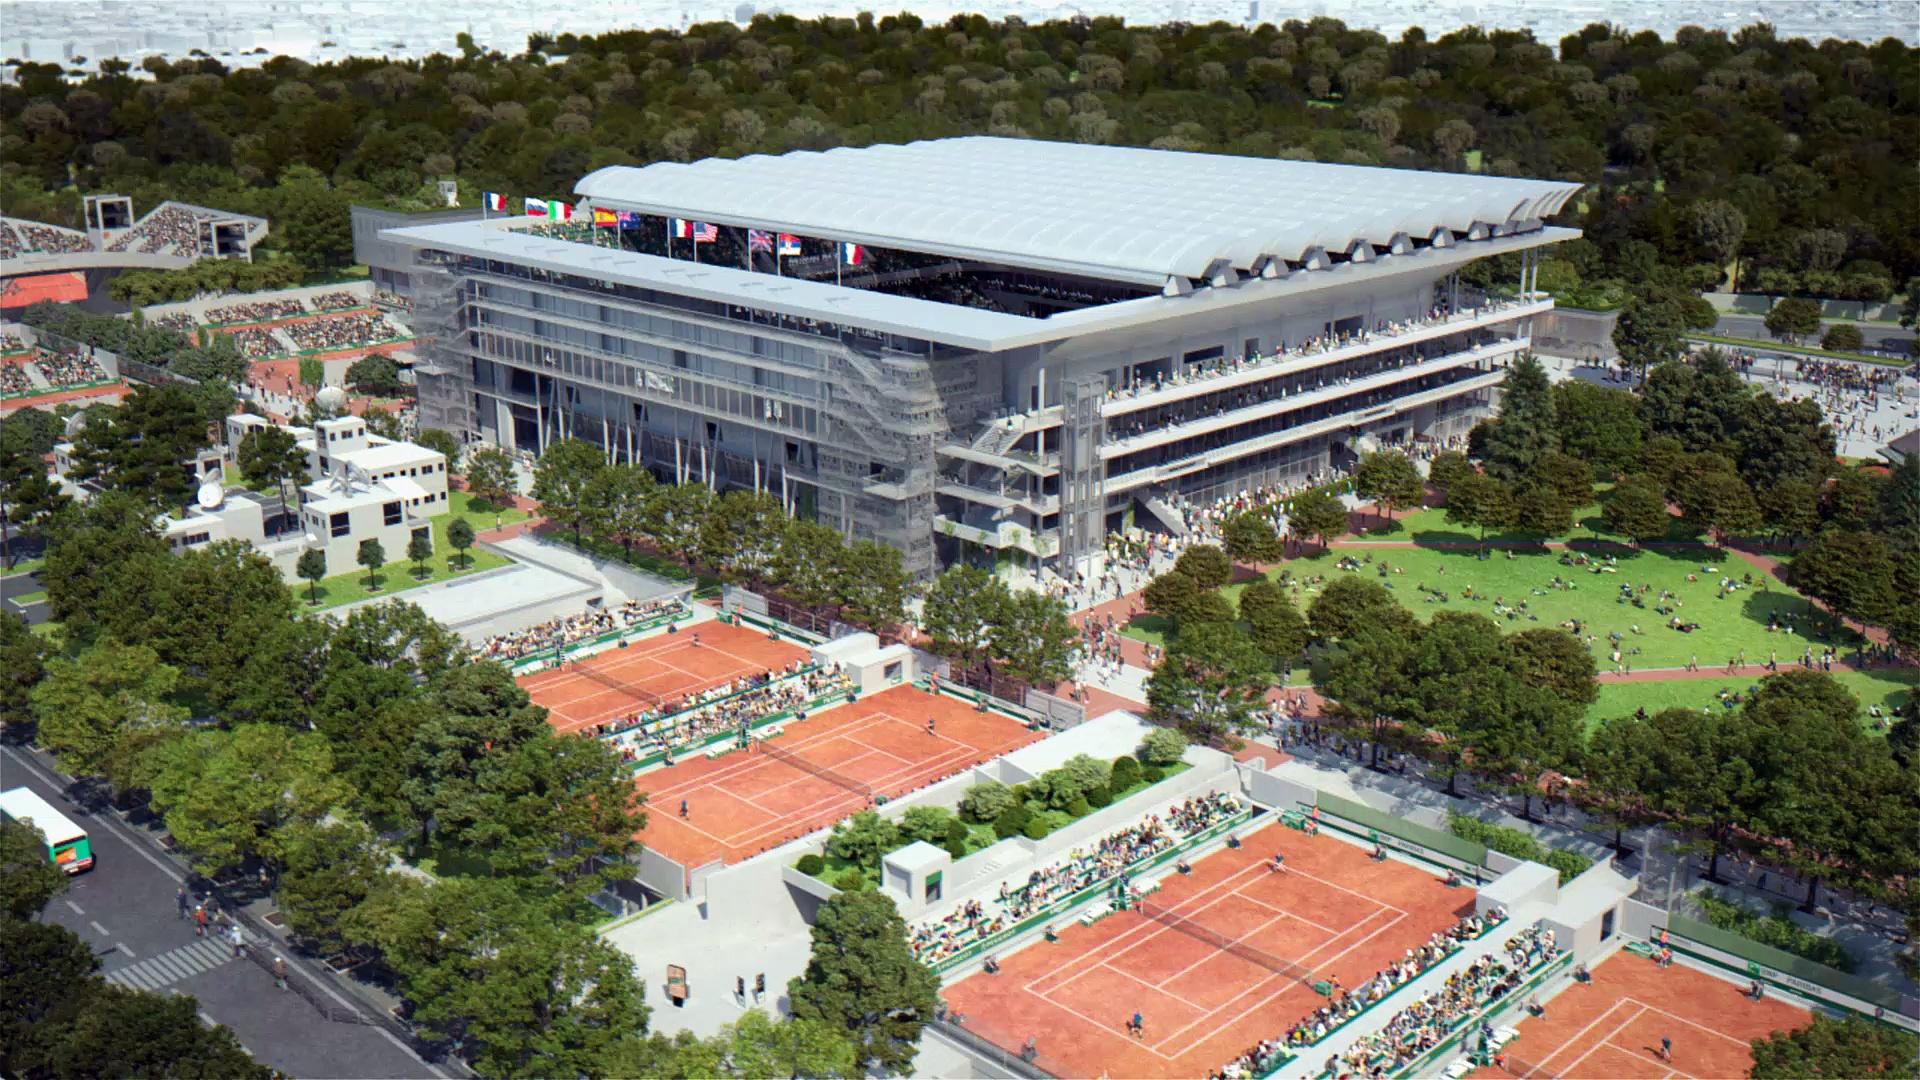 ROLAND GARROS 2019 - INSCRIPTIONS AUX CONCOURS ATP & WTA RG30MP